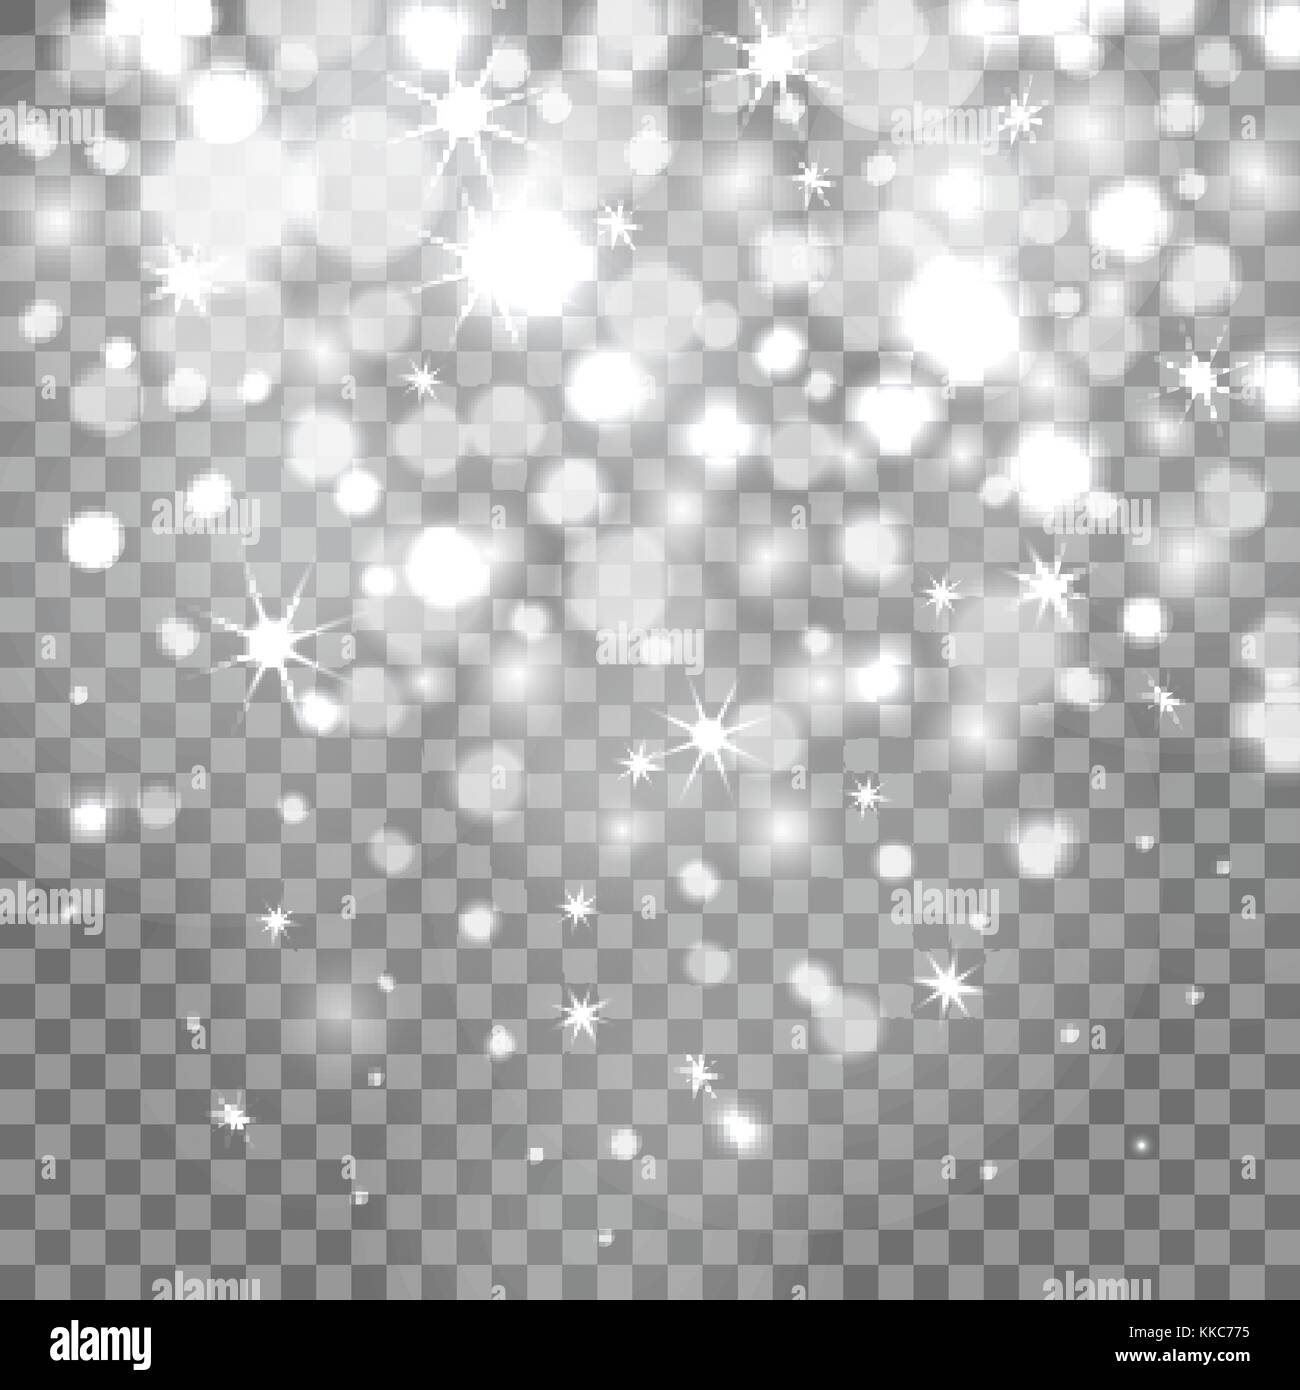 bokeh lights on transparent background stock vector art  u0026 illustration  vector image  166840889